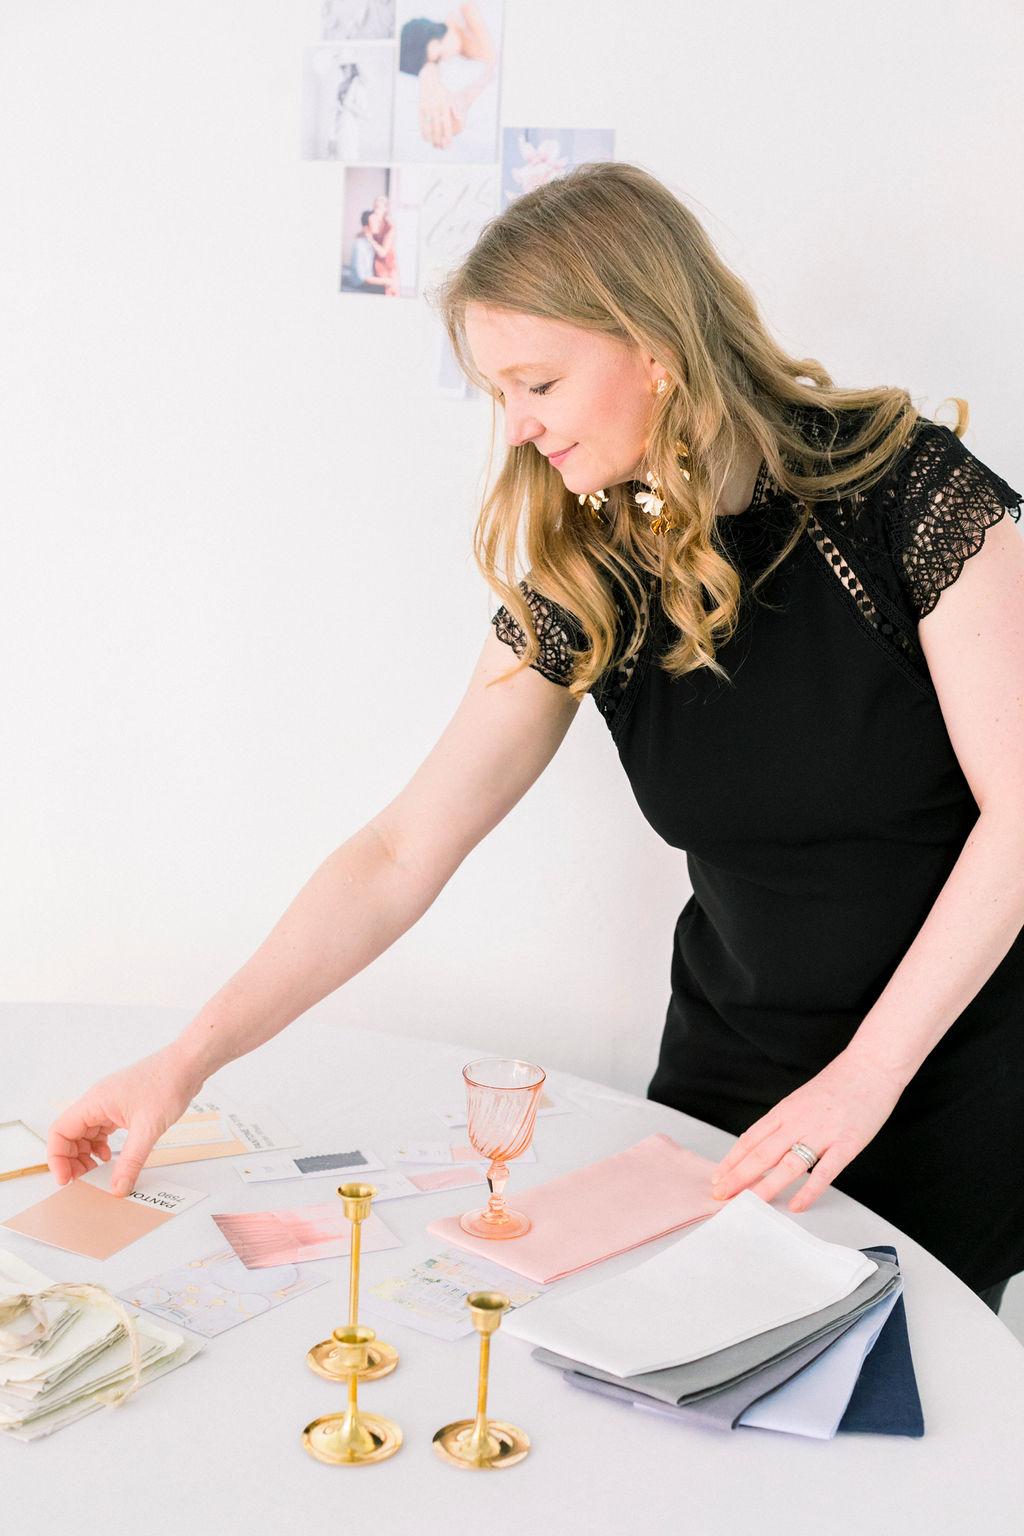 wedding stylist, creating a wedding design concept